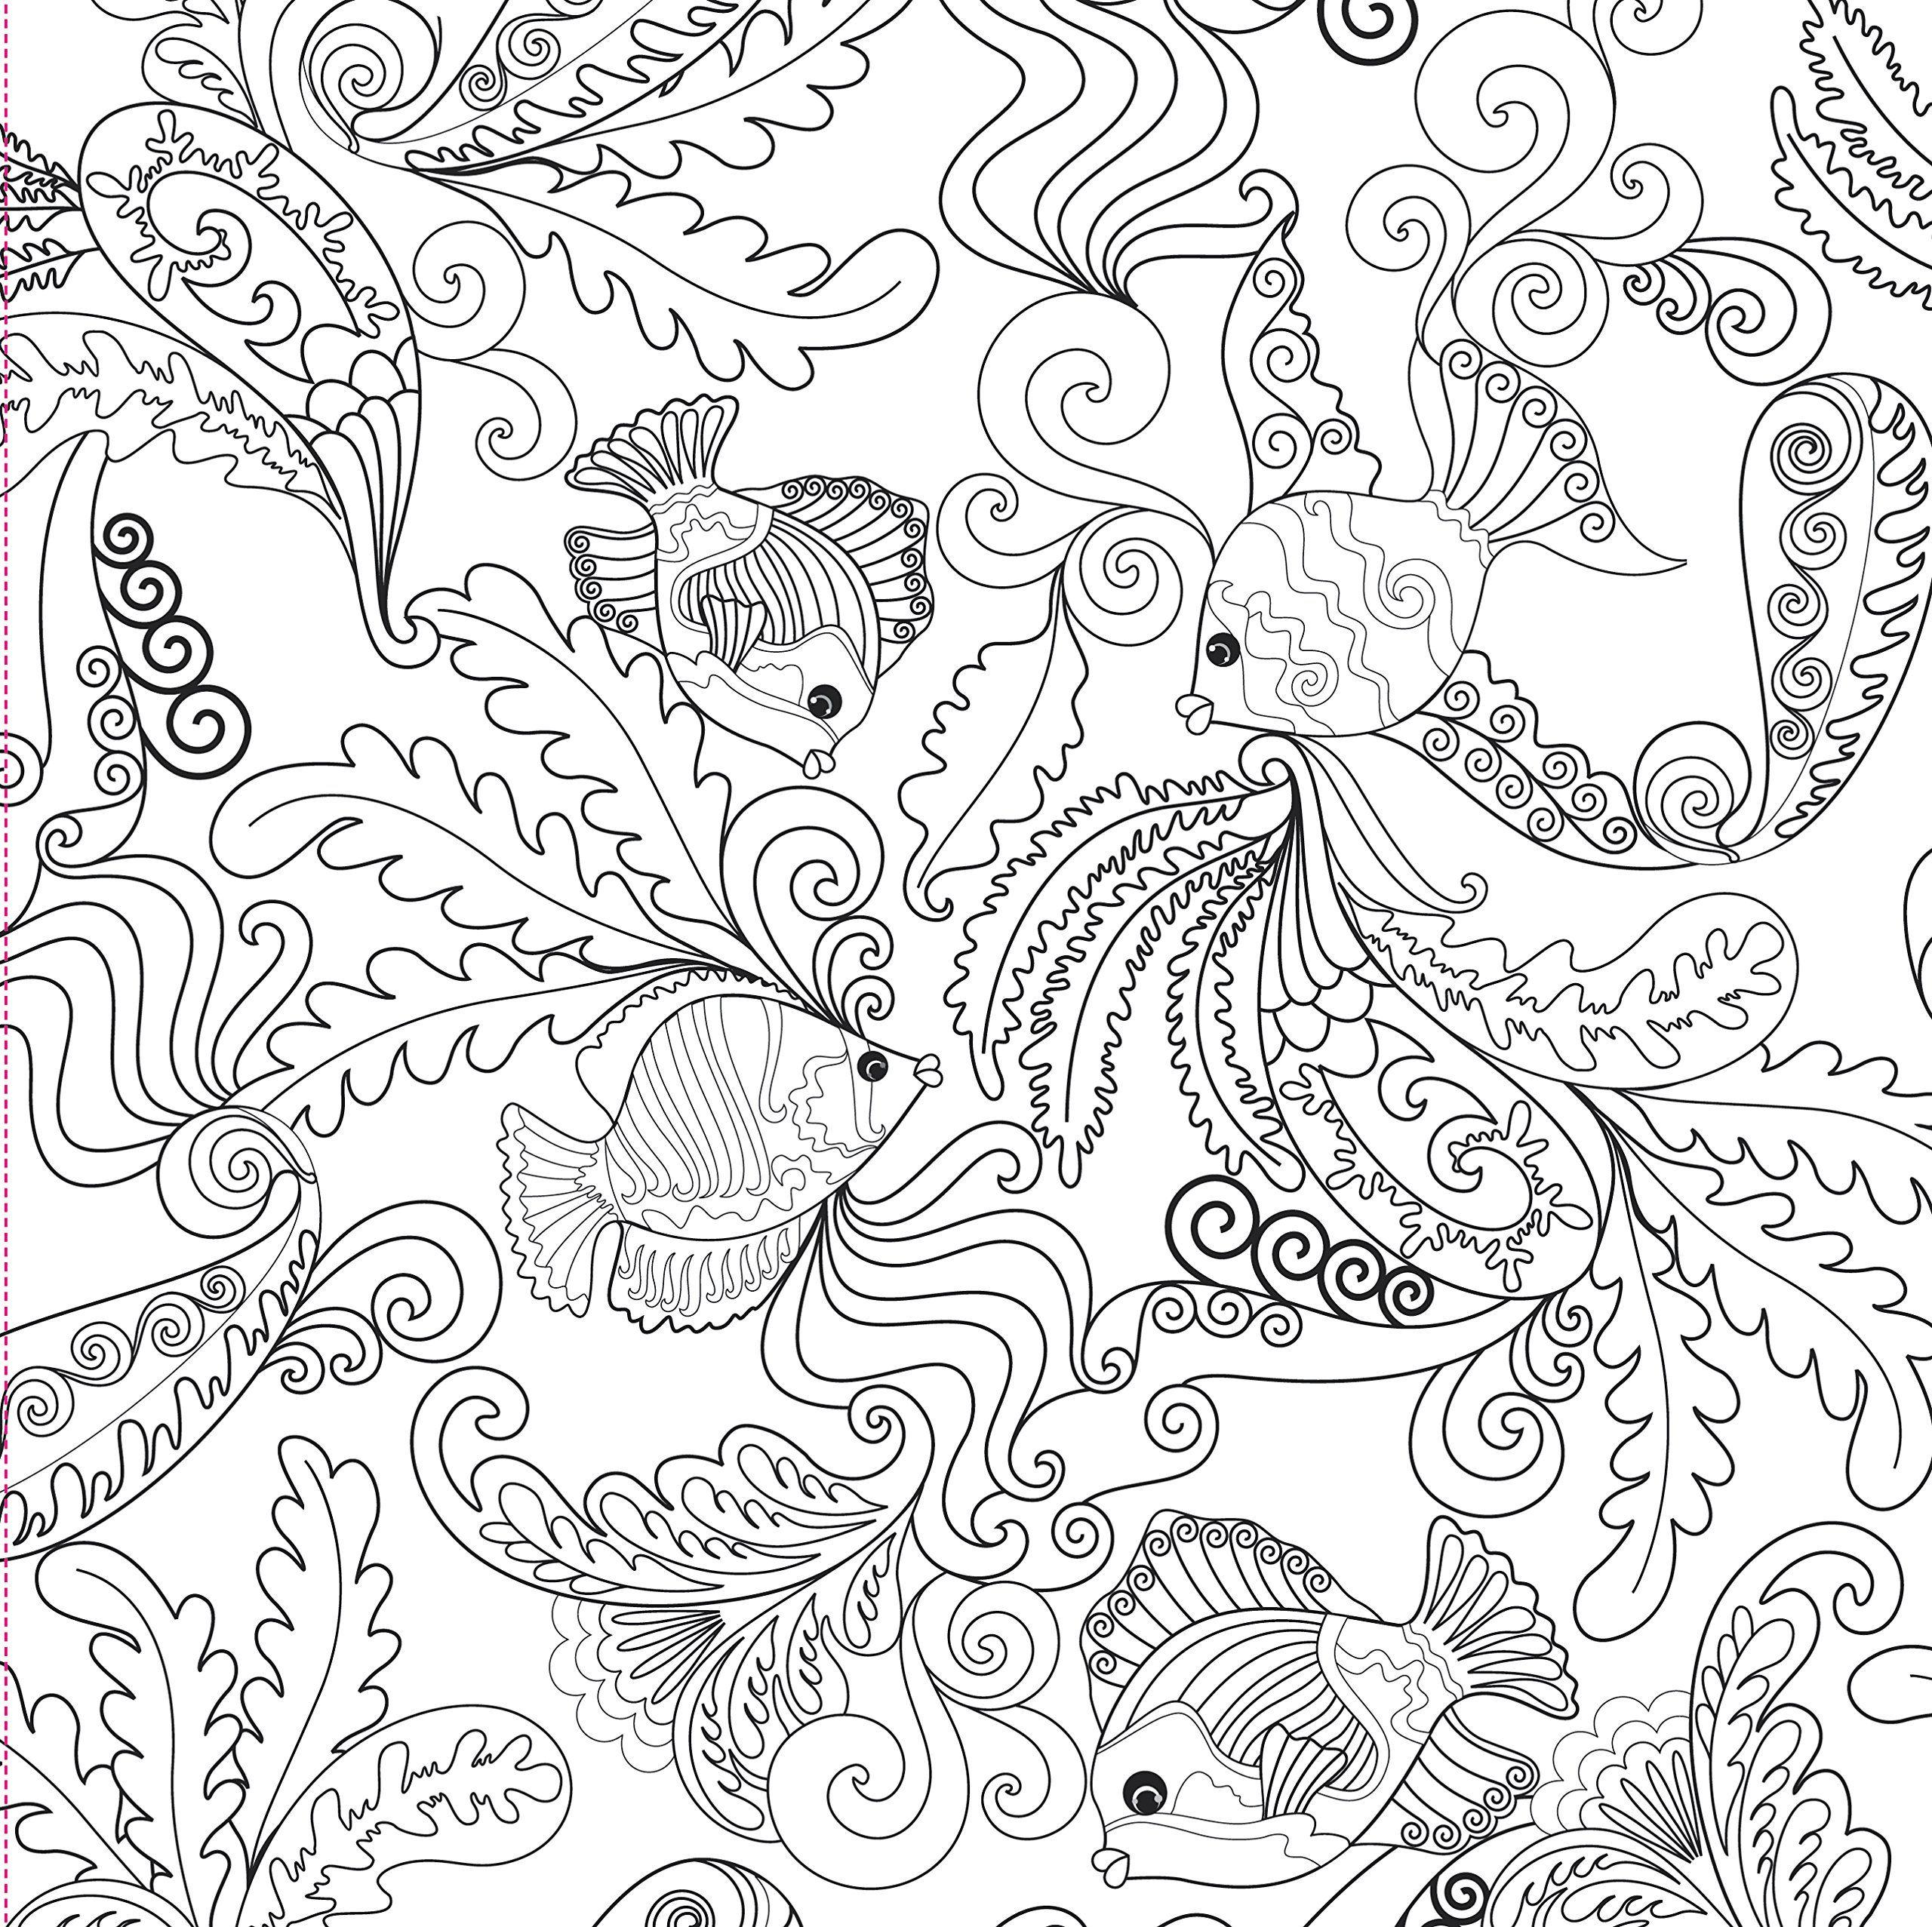 Ocean Designs Adult Coloring Book 31 Stress Relieving Designs Studio Peter Pauper Press